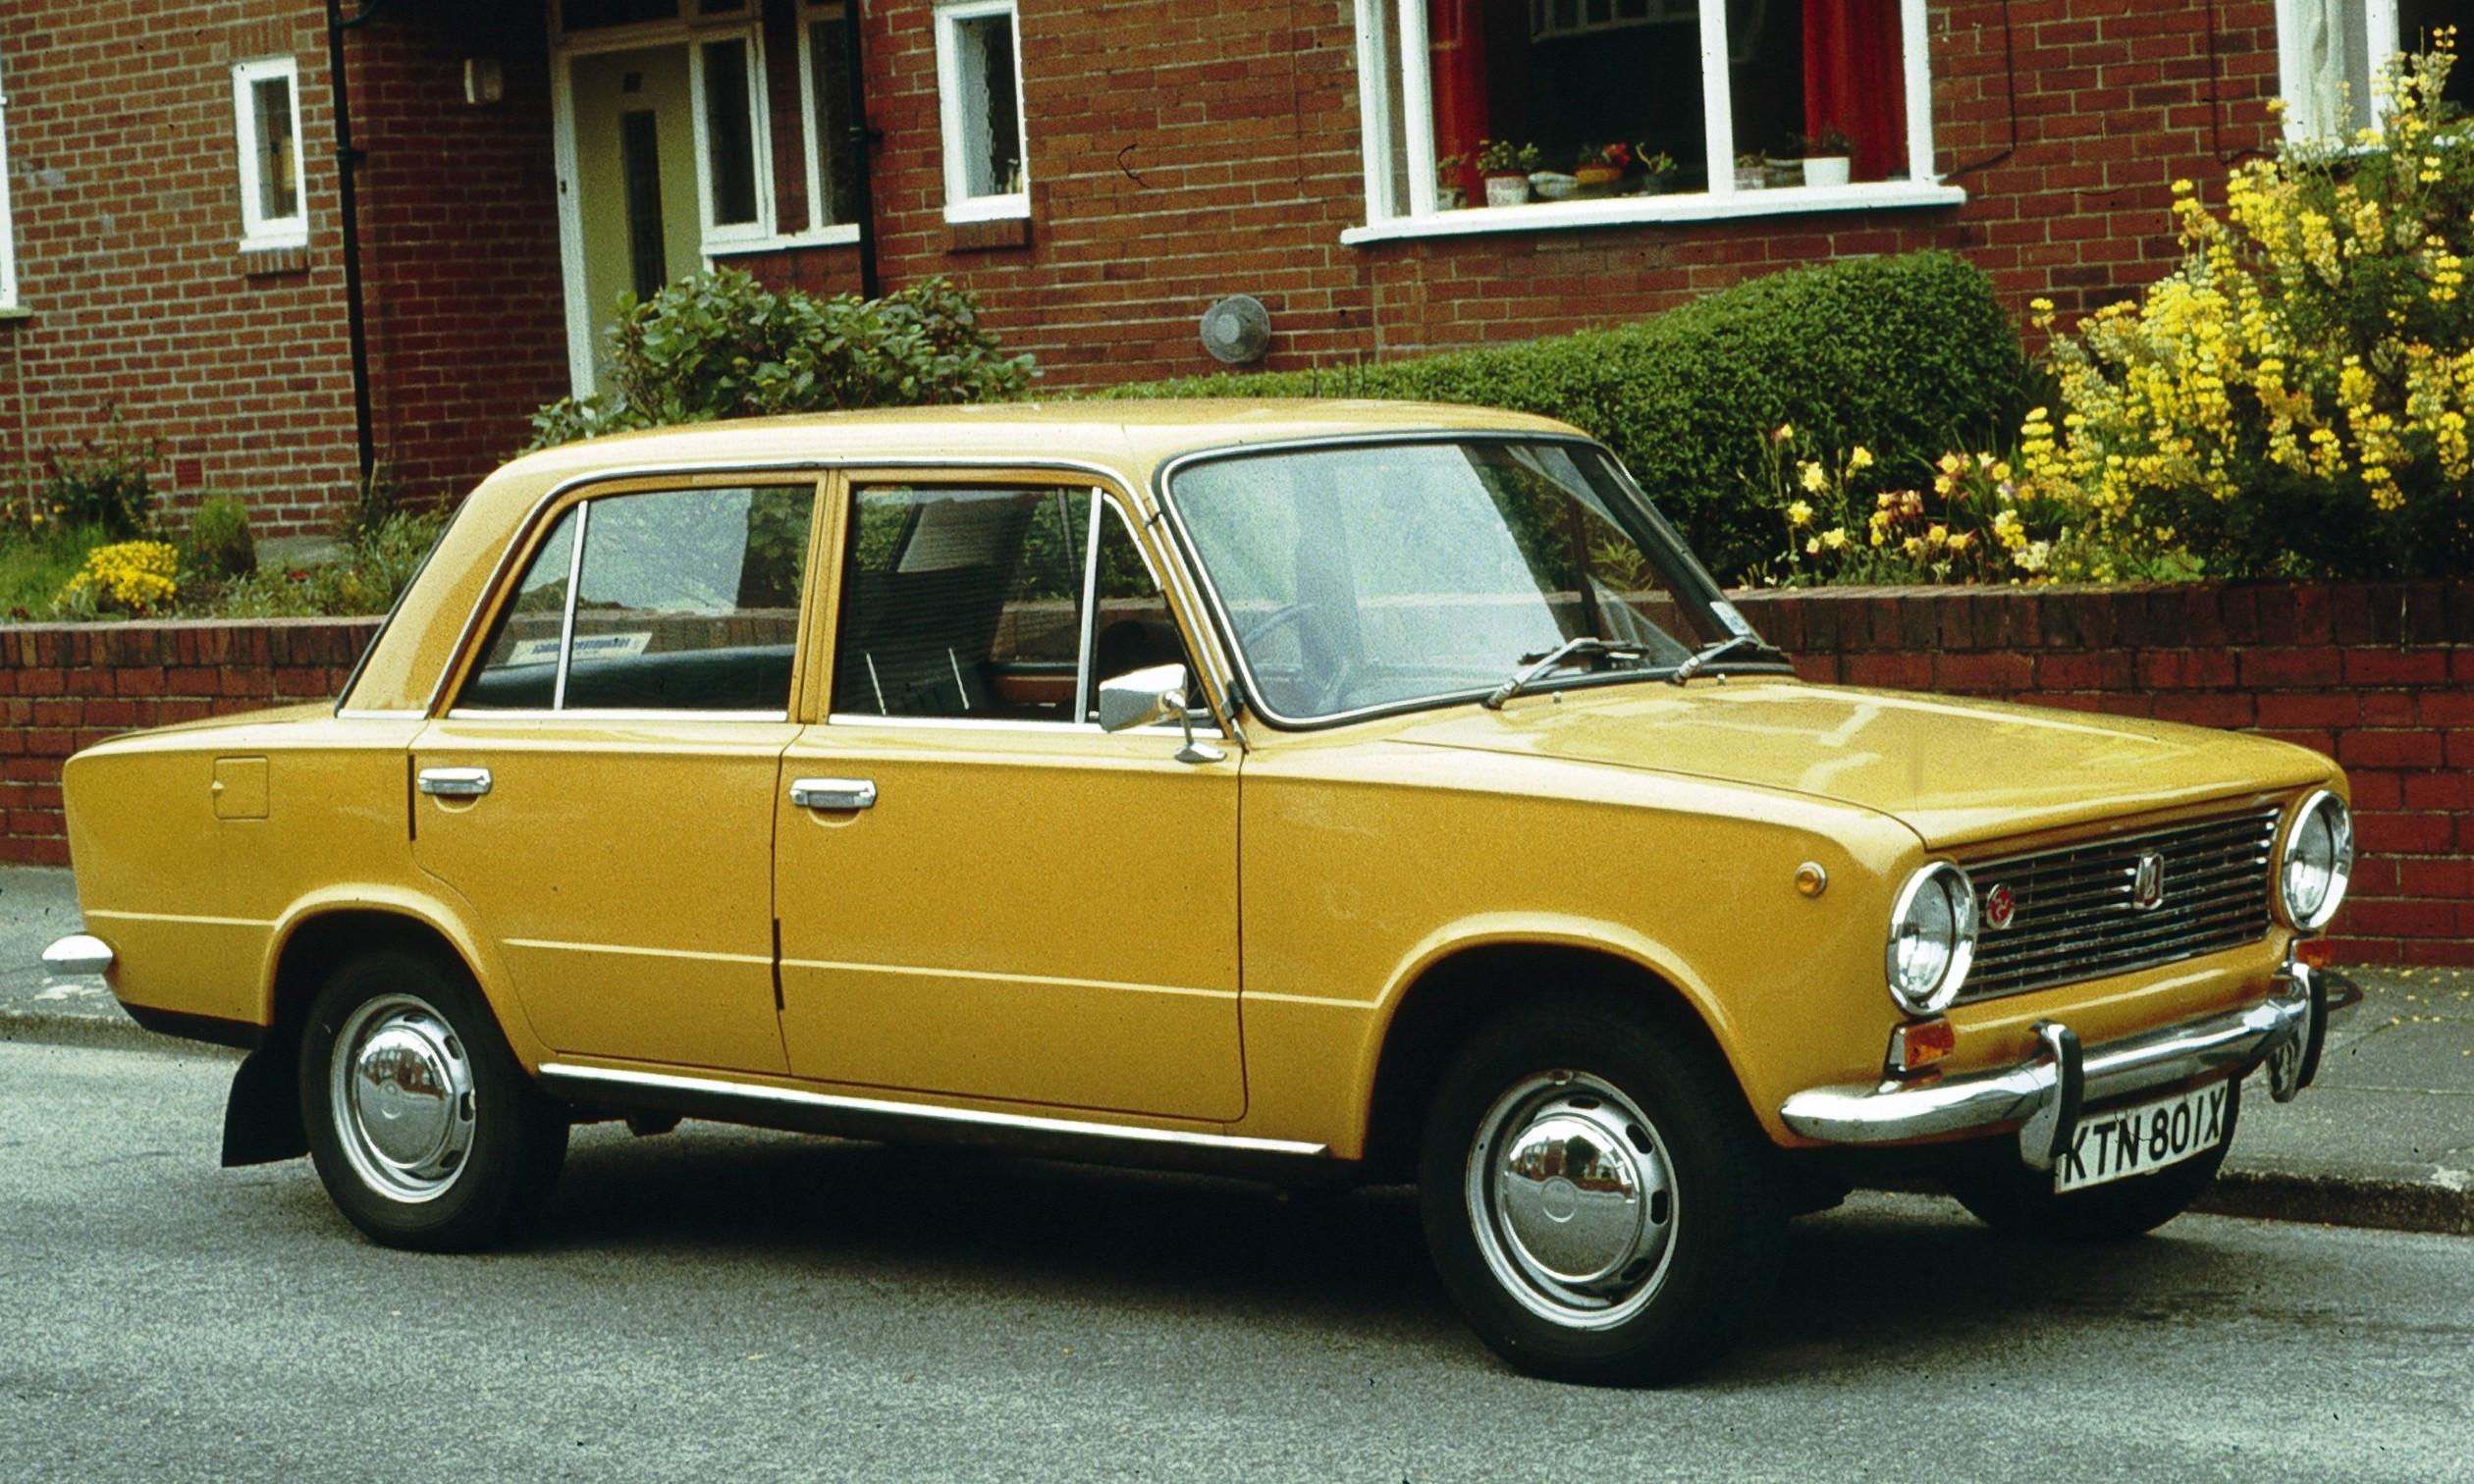 File:Lada 1300 (21012) in England 1981.jpg - Wikimedia Commons